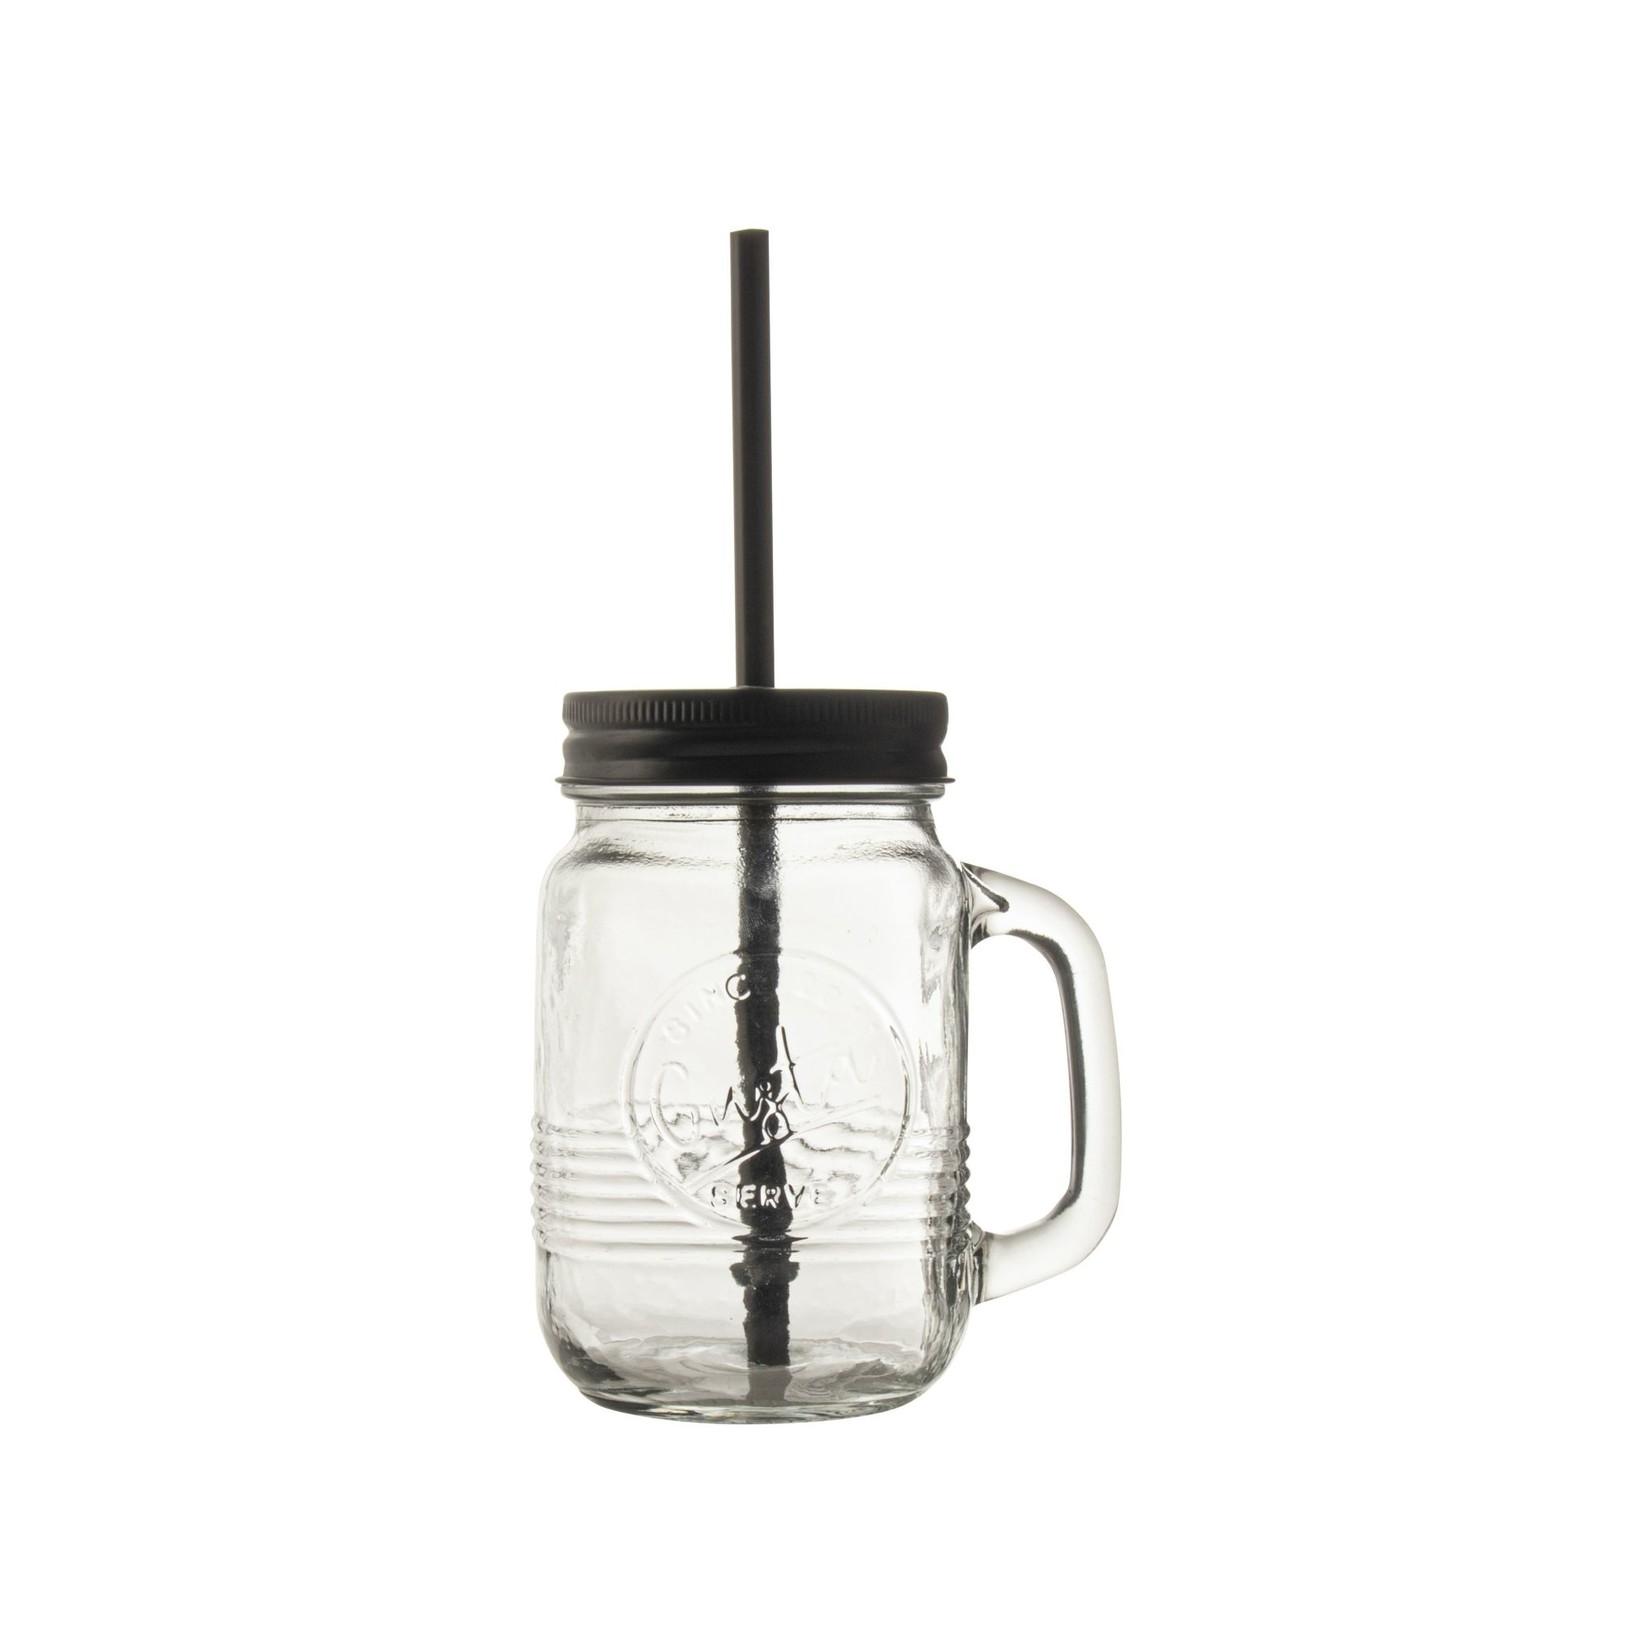 Gusta Mason Jar 500ml met rietje In a Jar